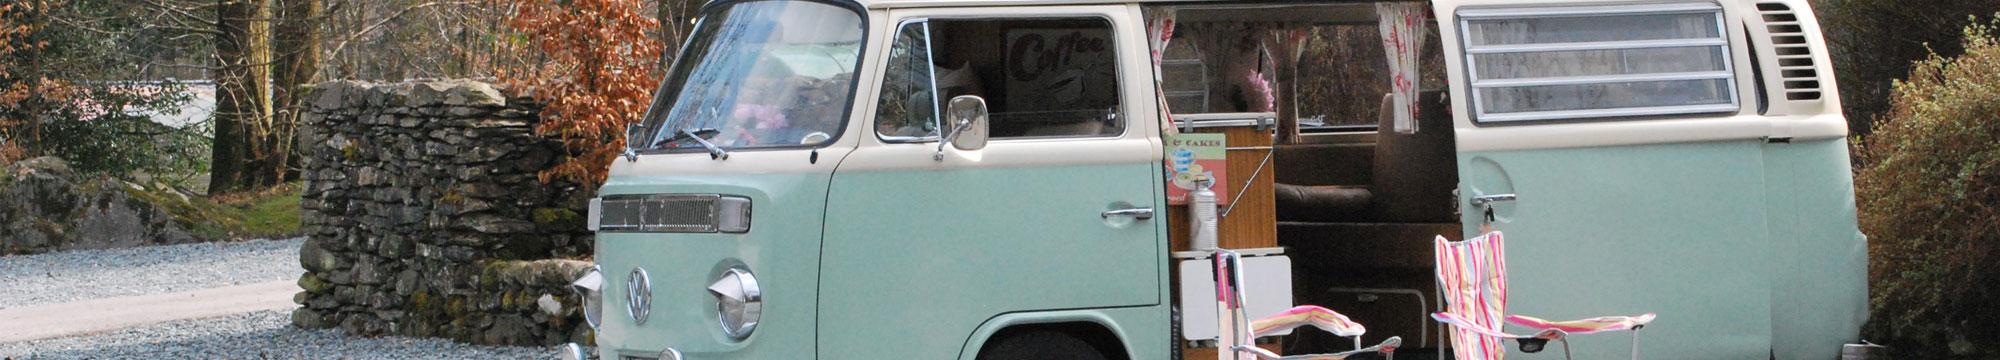 Volkswagen campervan at Skelwith Fold Caravan Park